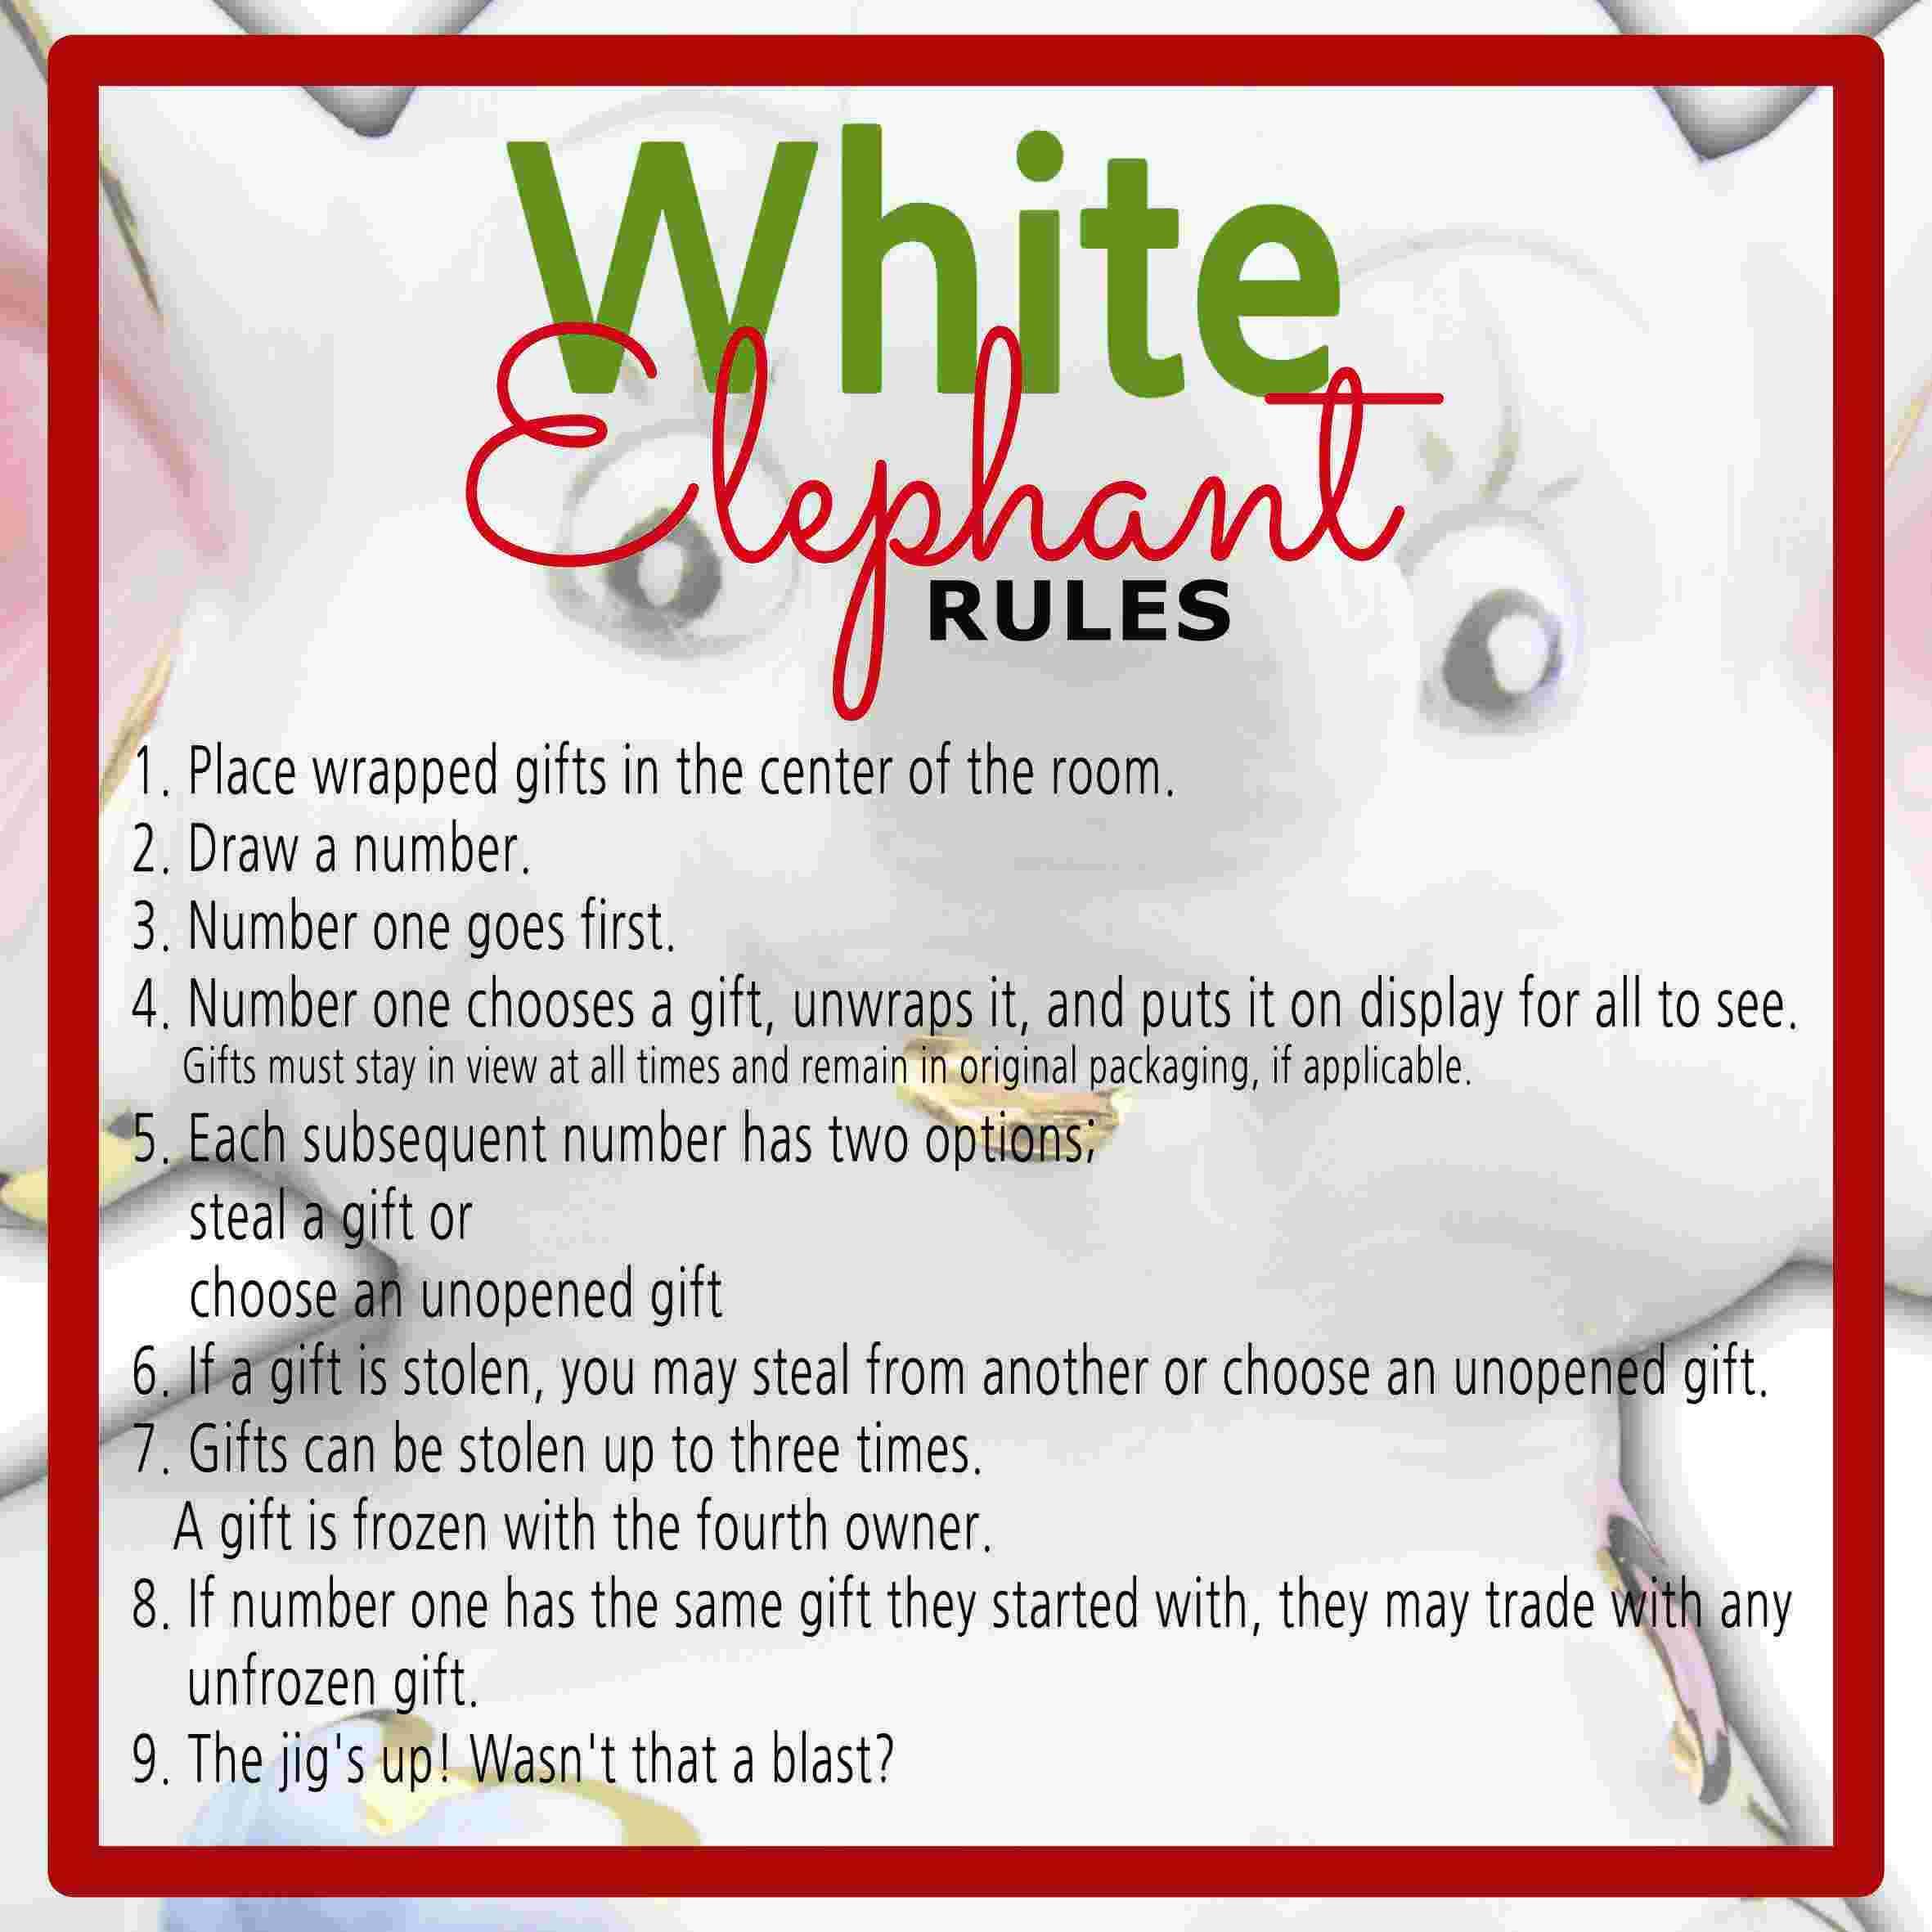 photograph relating to White Elephant Rules Printable identify White Elephant Reward Substitute Legislation Printable